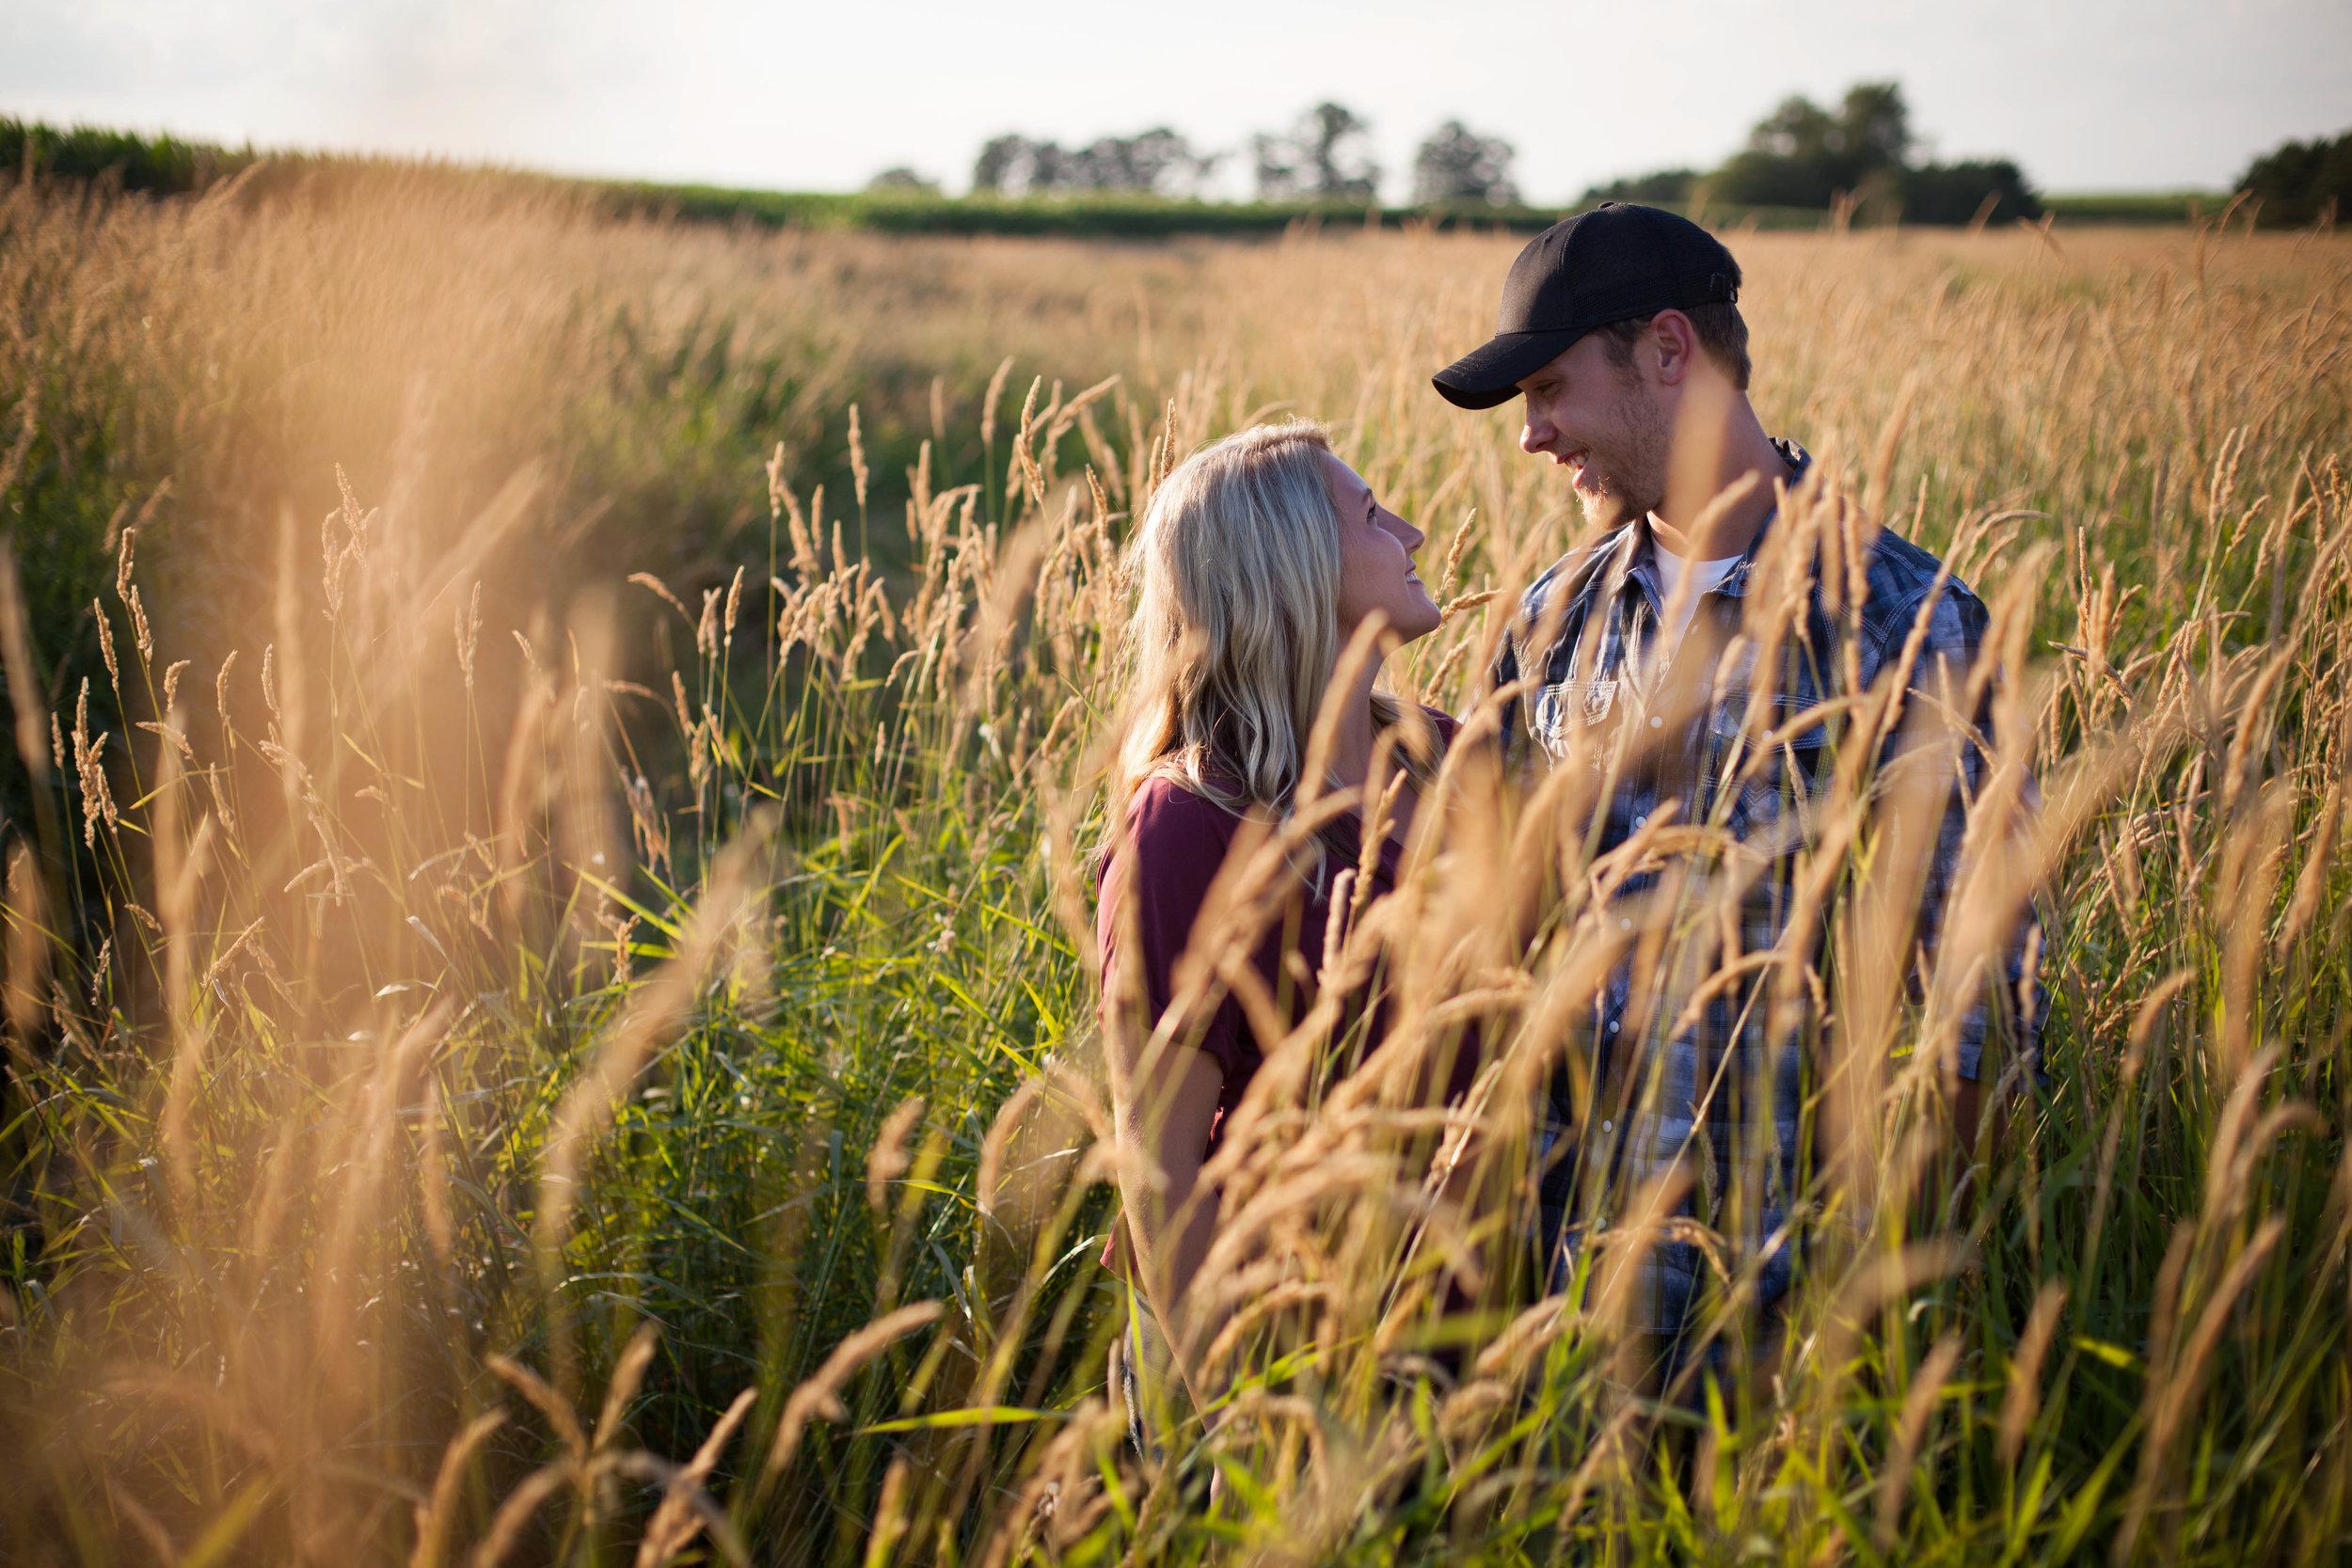 minnesota proposal engagement © kelilina photography 20170715144051.jpg